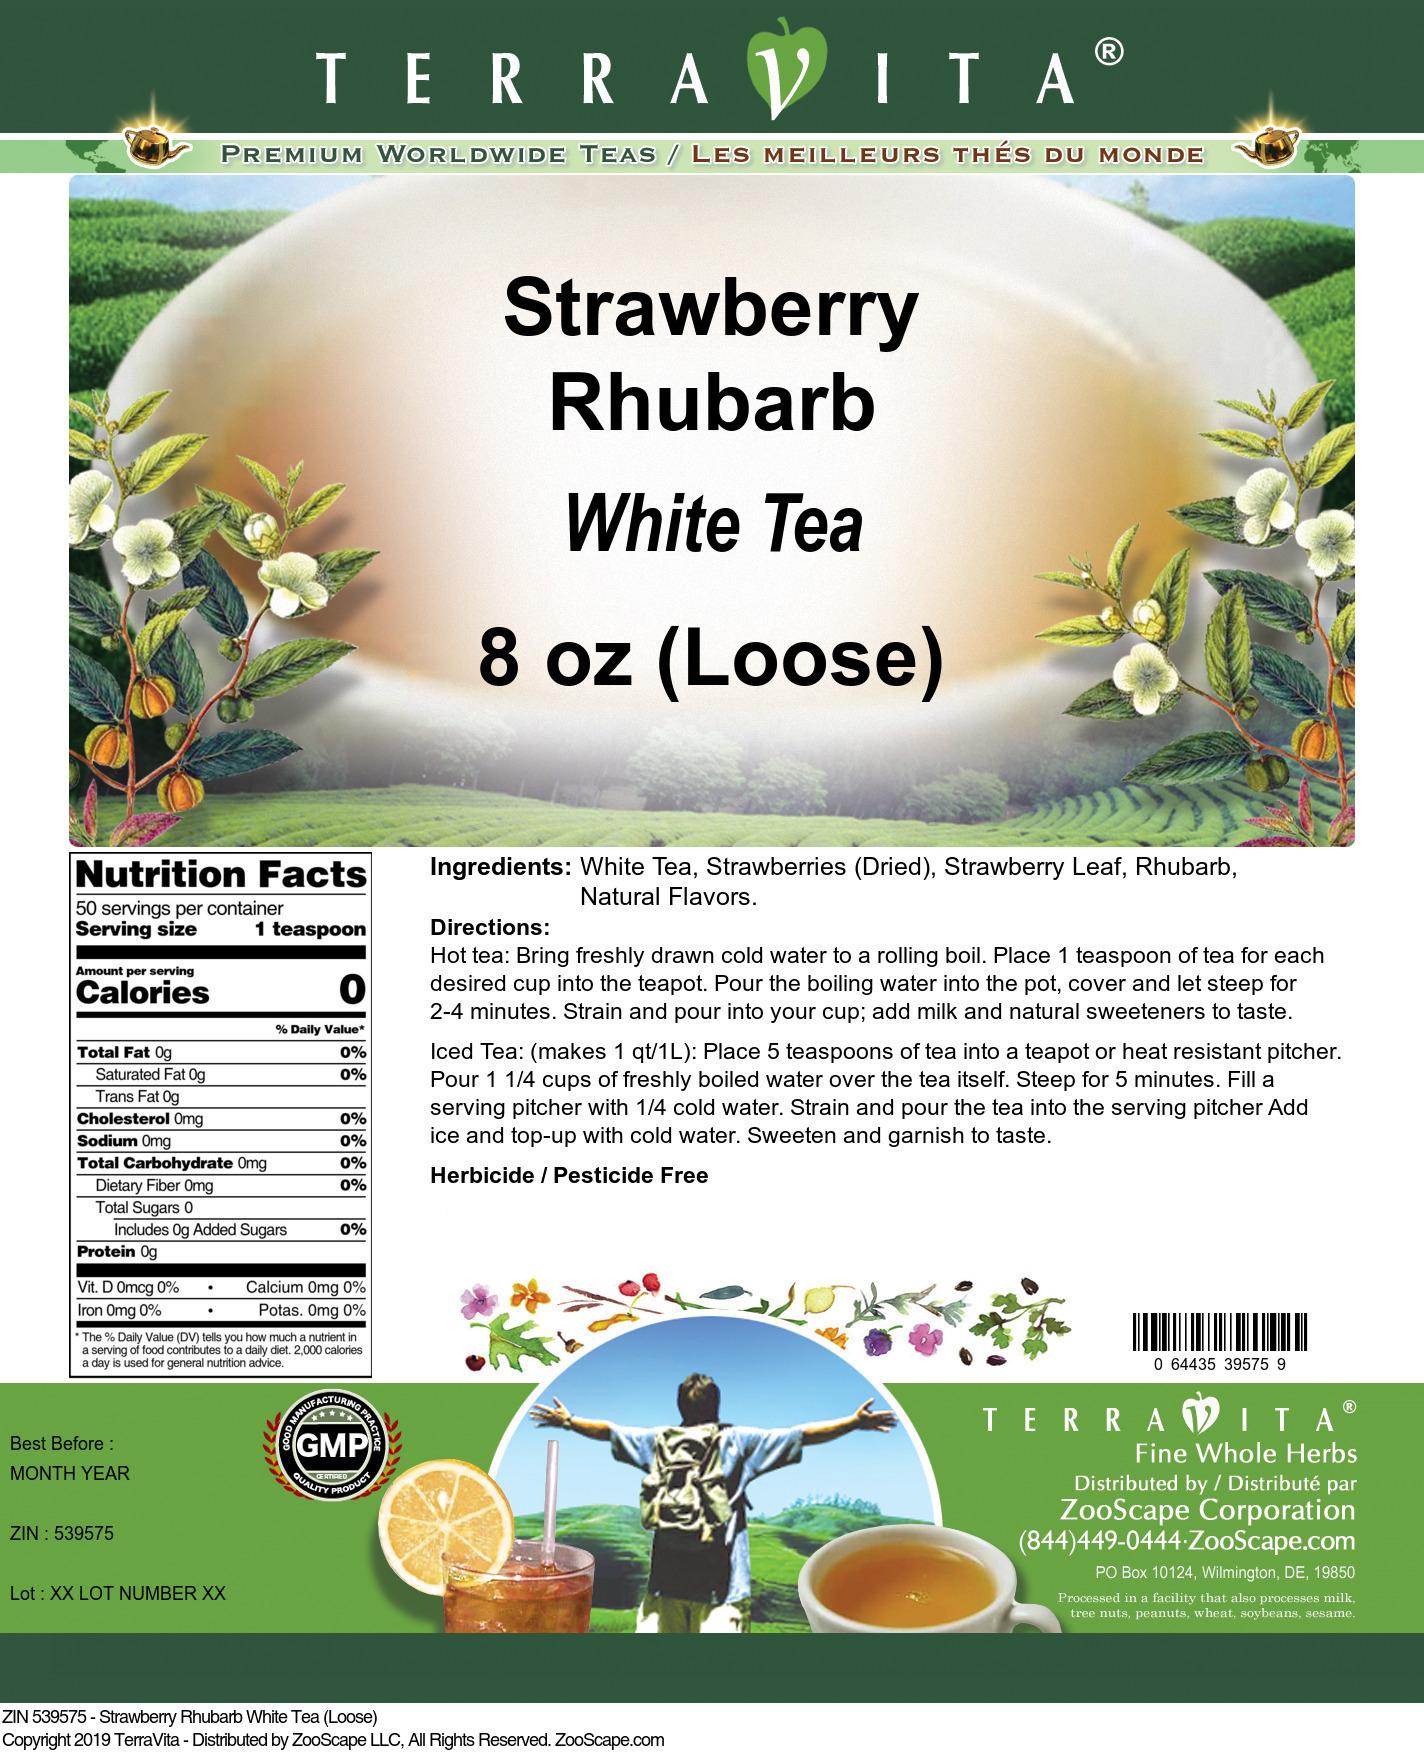 Strawberry Rhubarb White Tea (Loose)